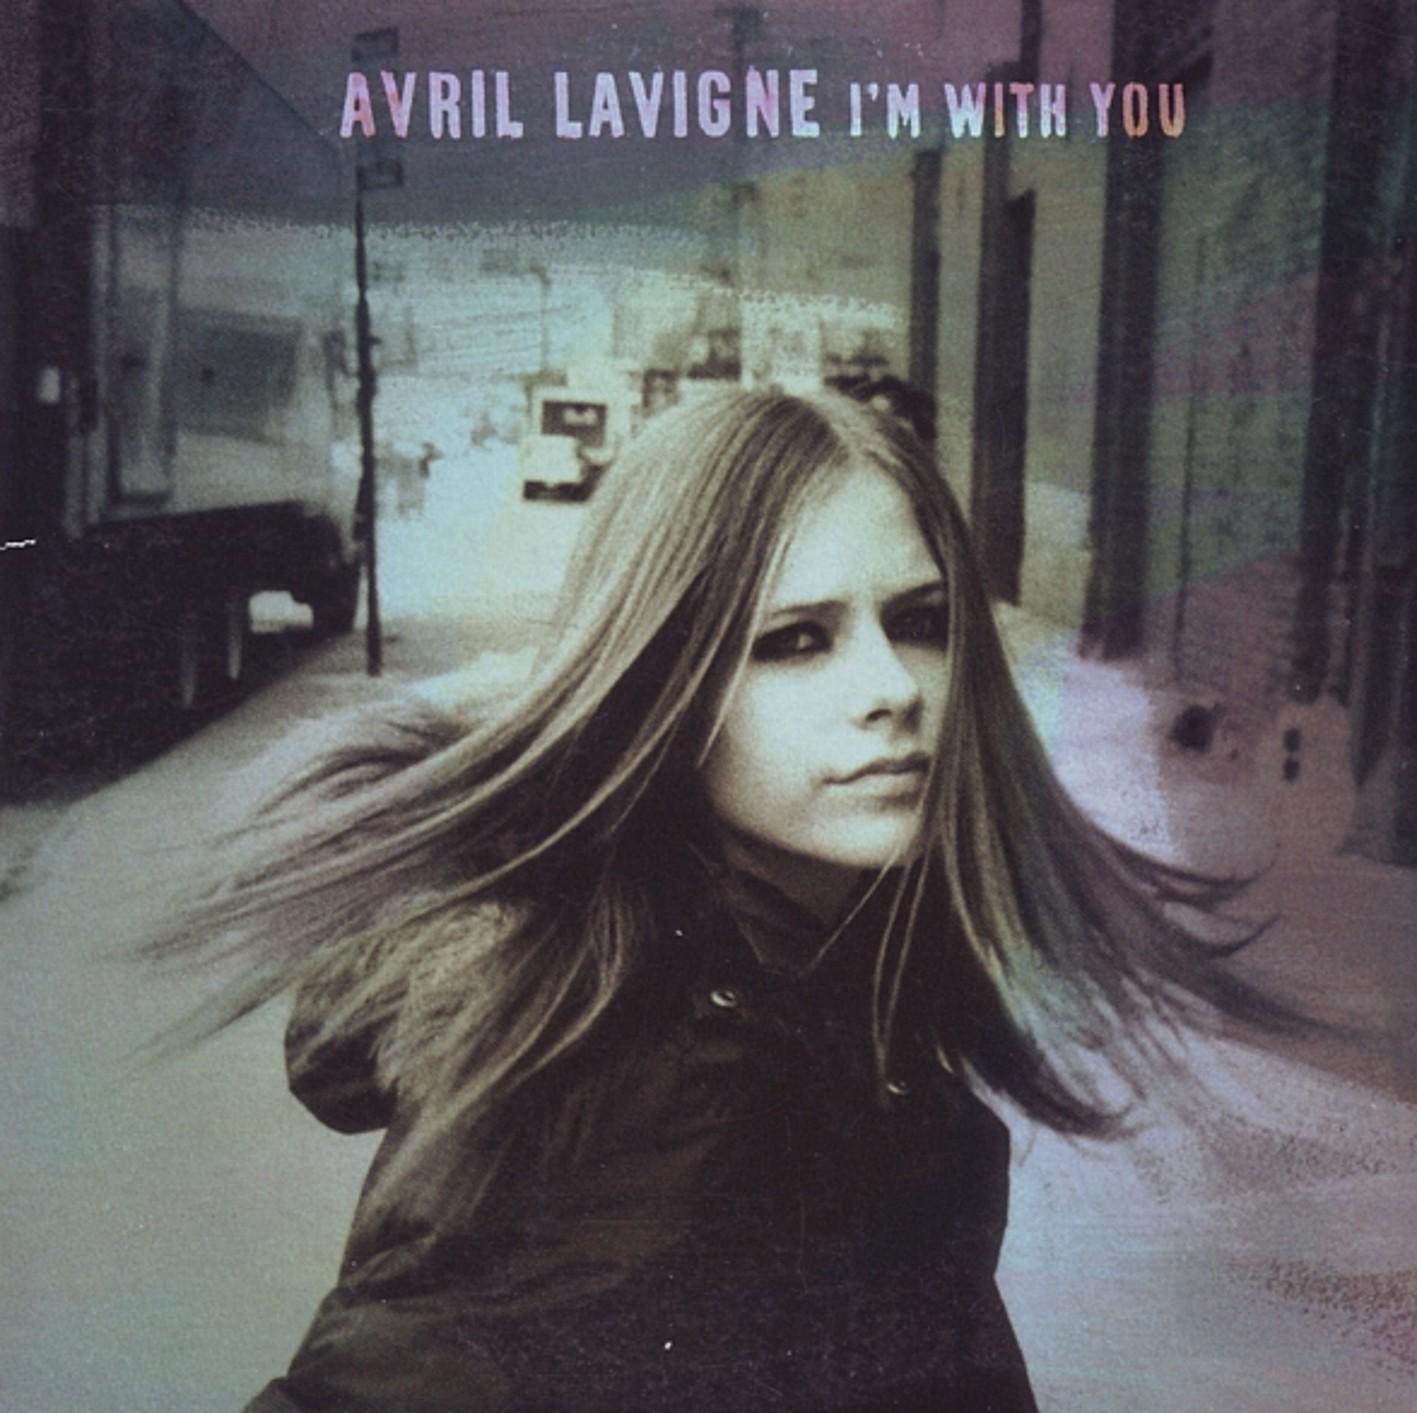 http://3.bp.blogspot.com/-WMUVaPdA7l8/Tzlc3EkdmqI/AAAAAAAABEA/CGu56cHGd74/s1600/Avril+Lavigne+-+I\'m+With+You.jpg